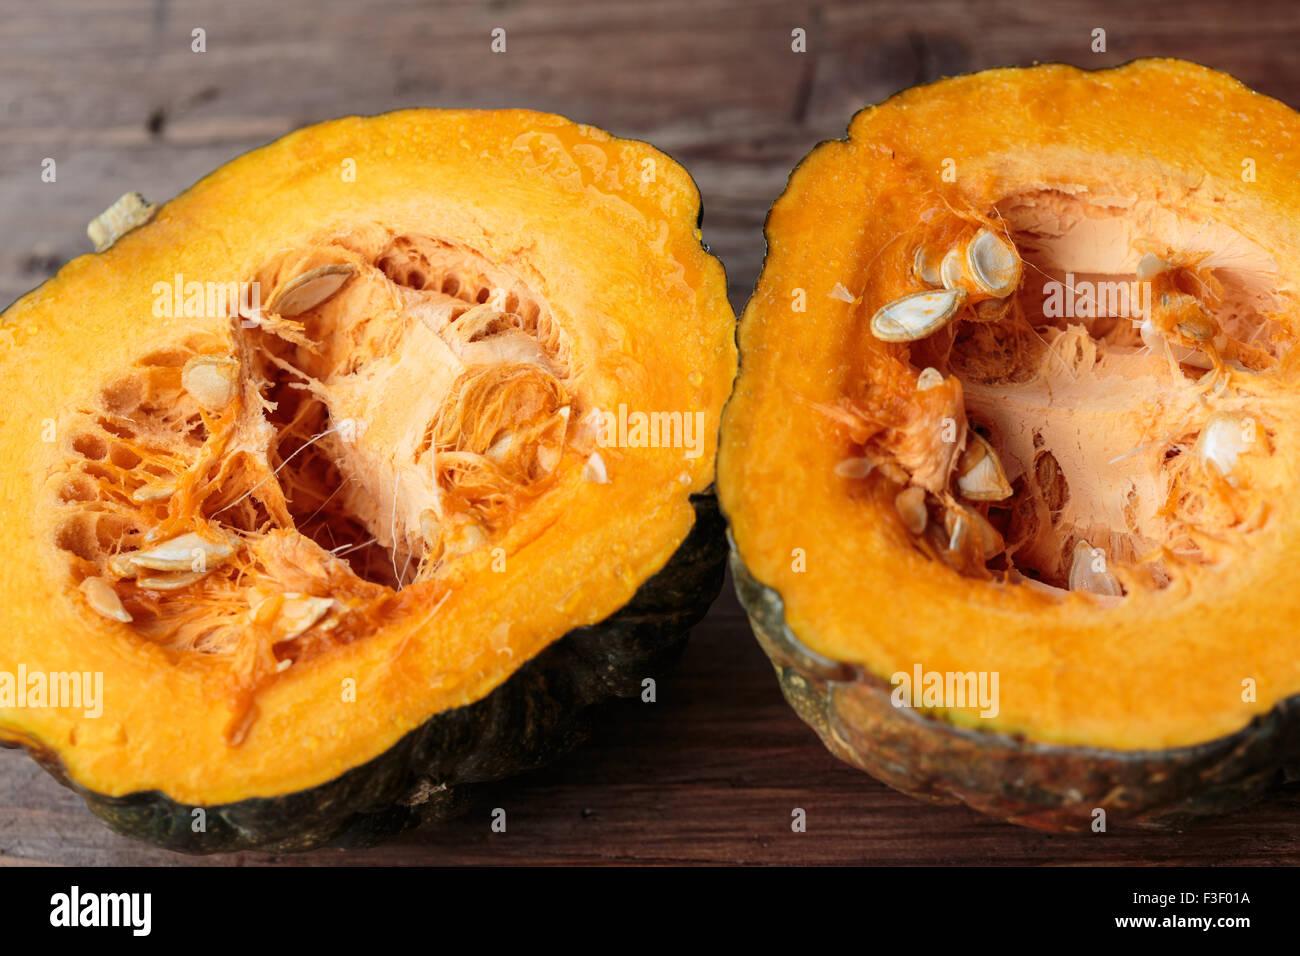 Halved pumpkin on wooden table - Stock Image